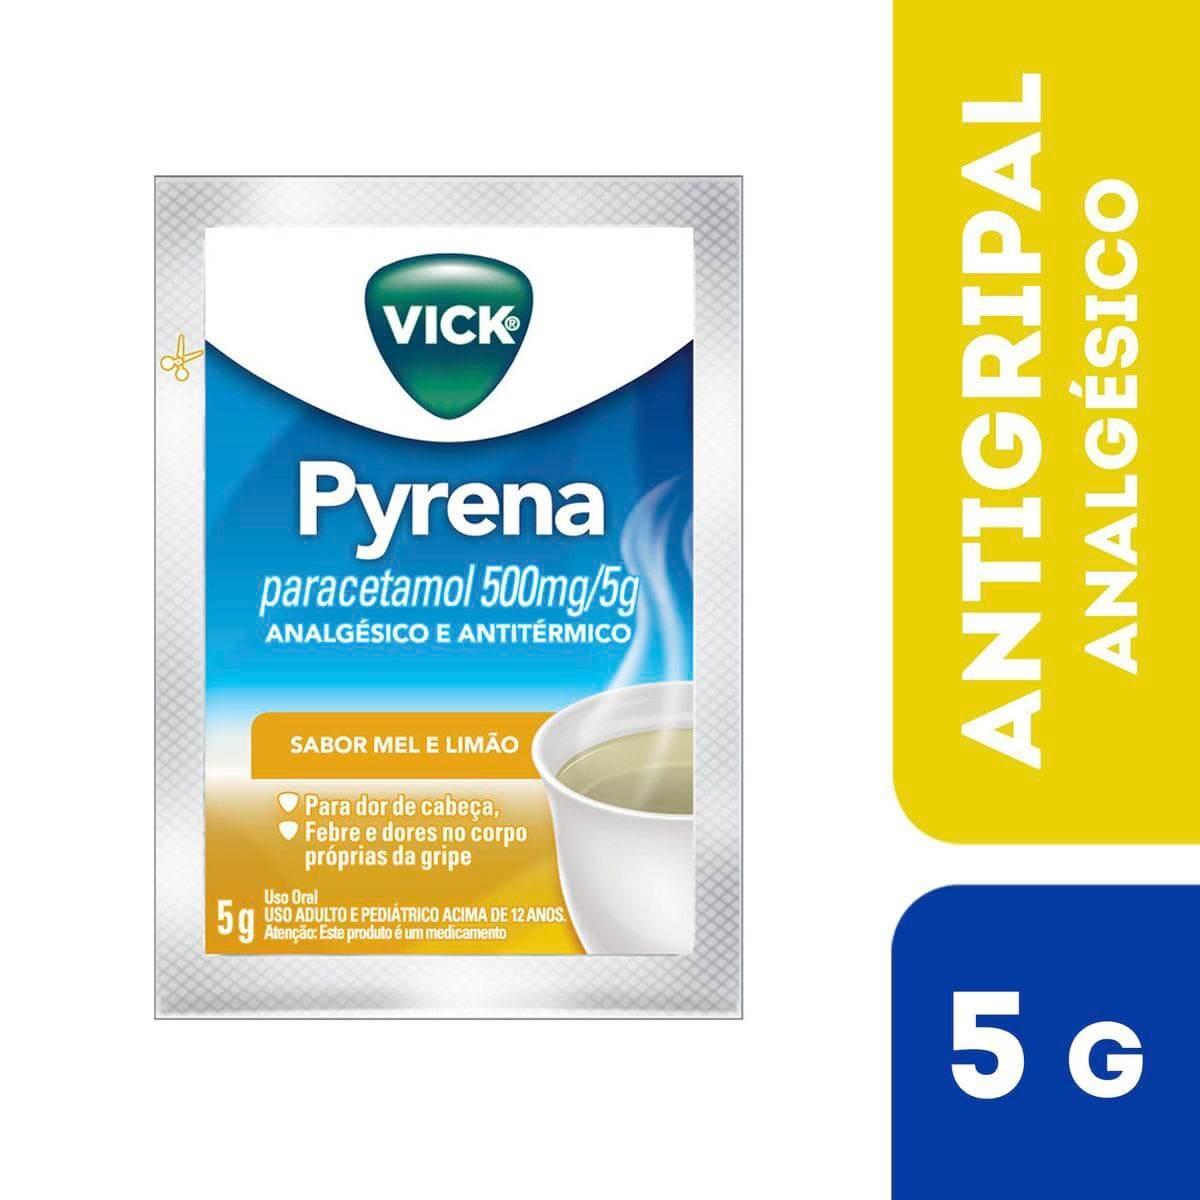 Paracetamol ou ibuprofeno para gripe